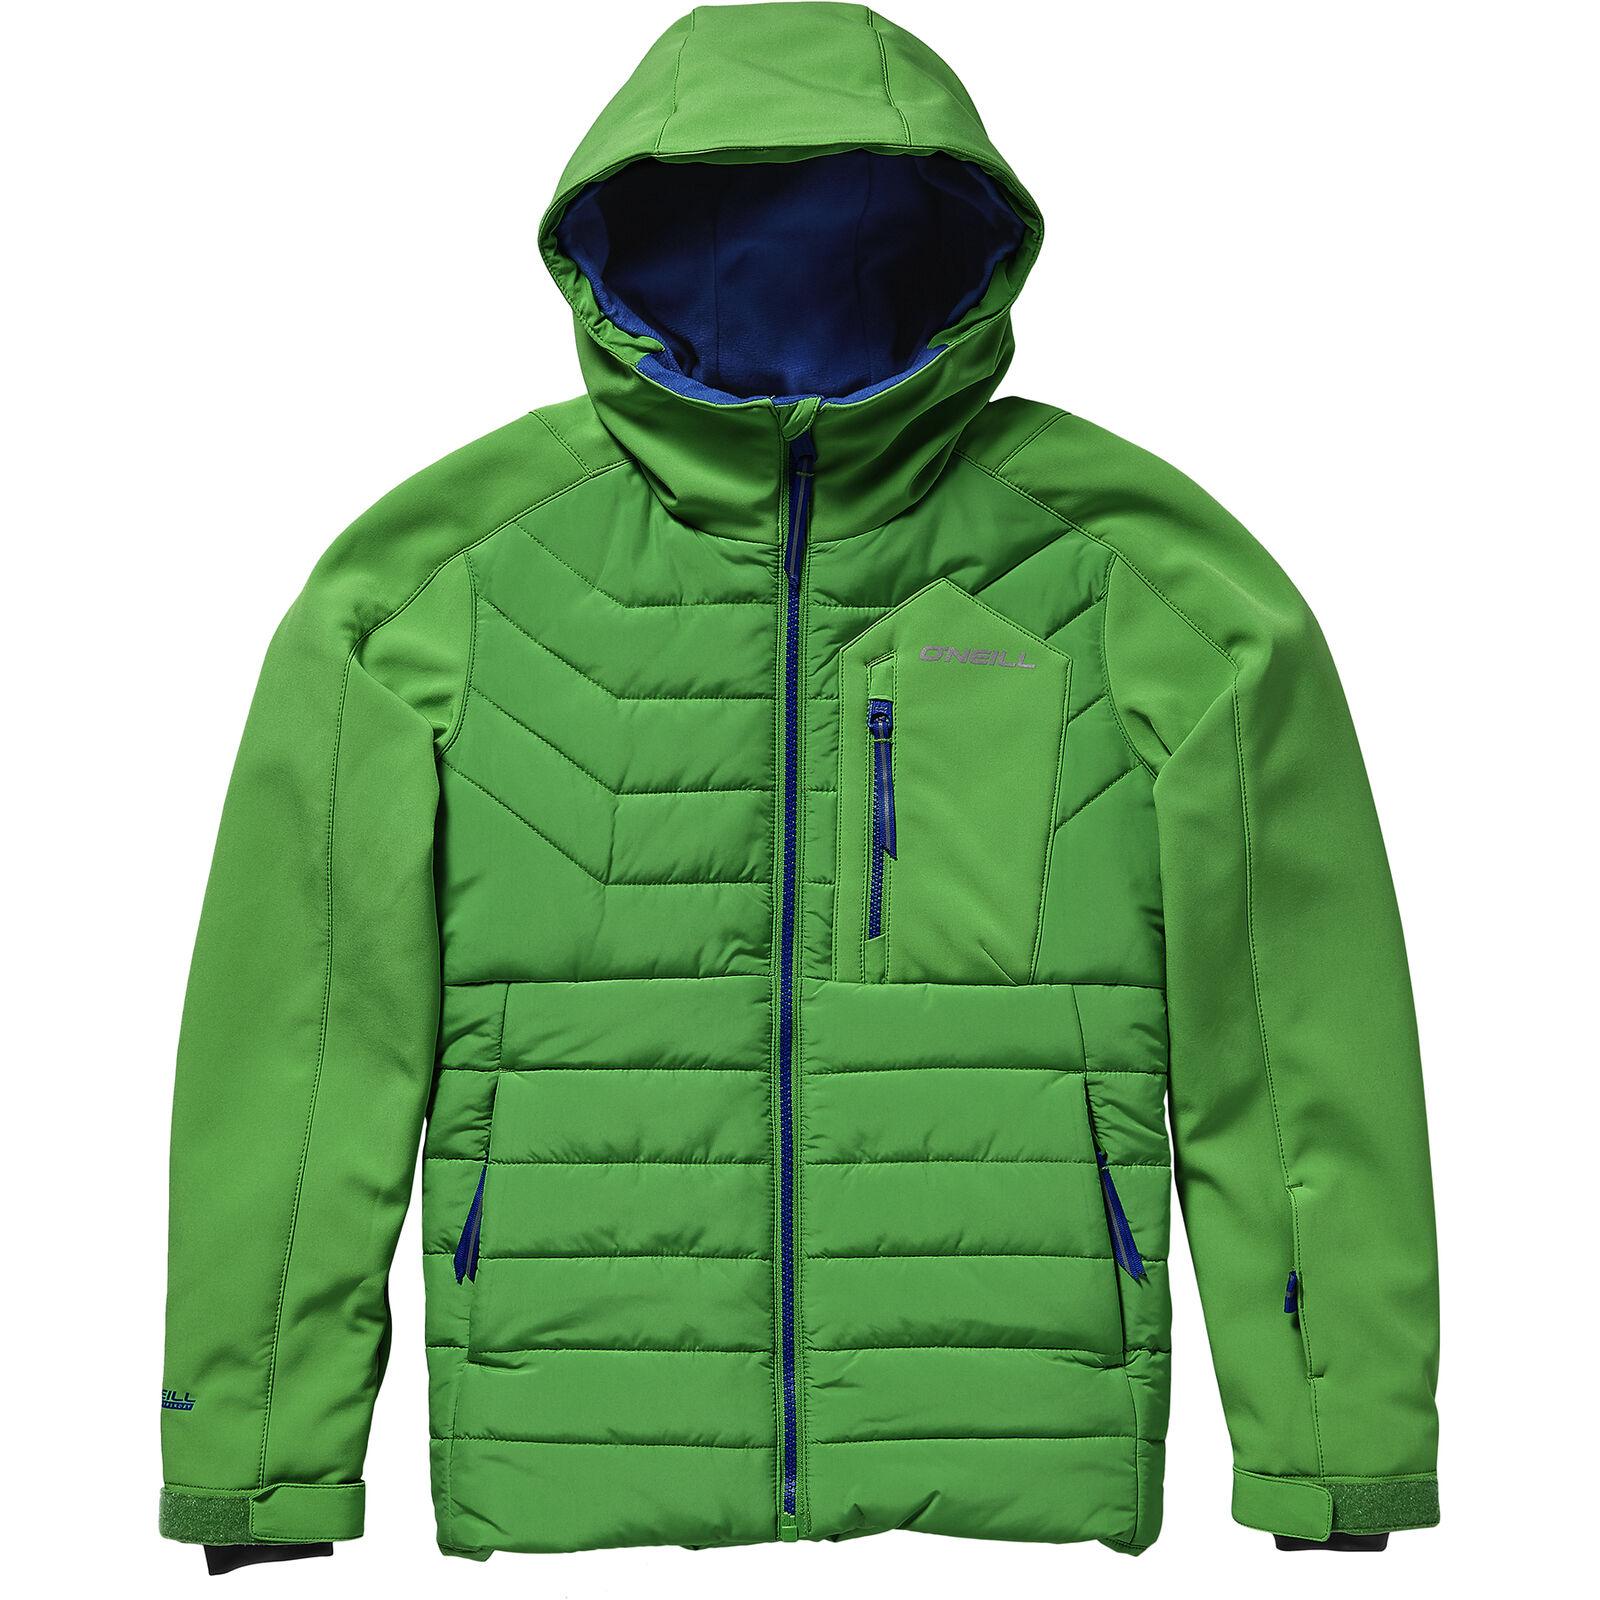 O'Neill Chaqueta Esquí Snowboard Pb 37-n Chaqueta verde Impermeable